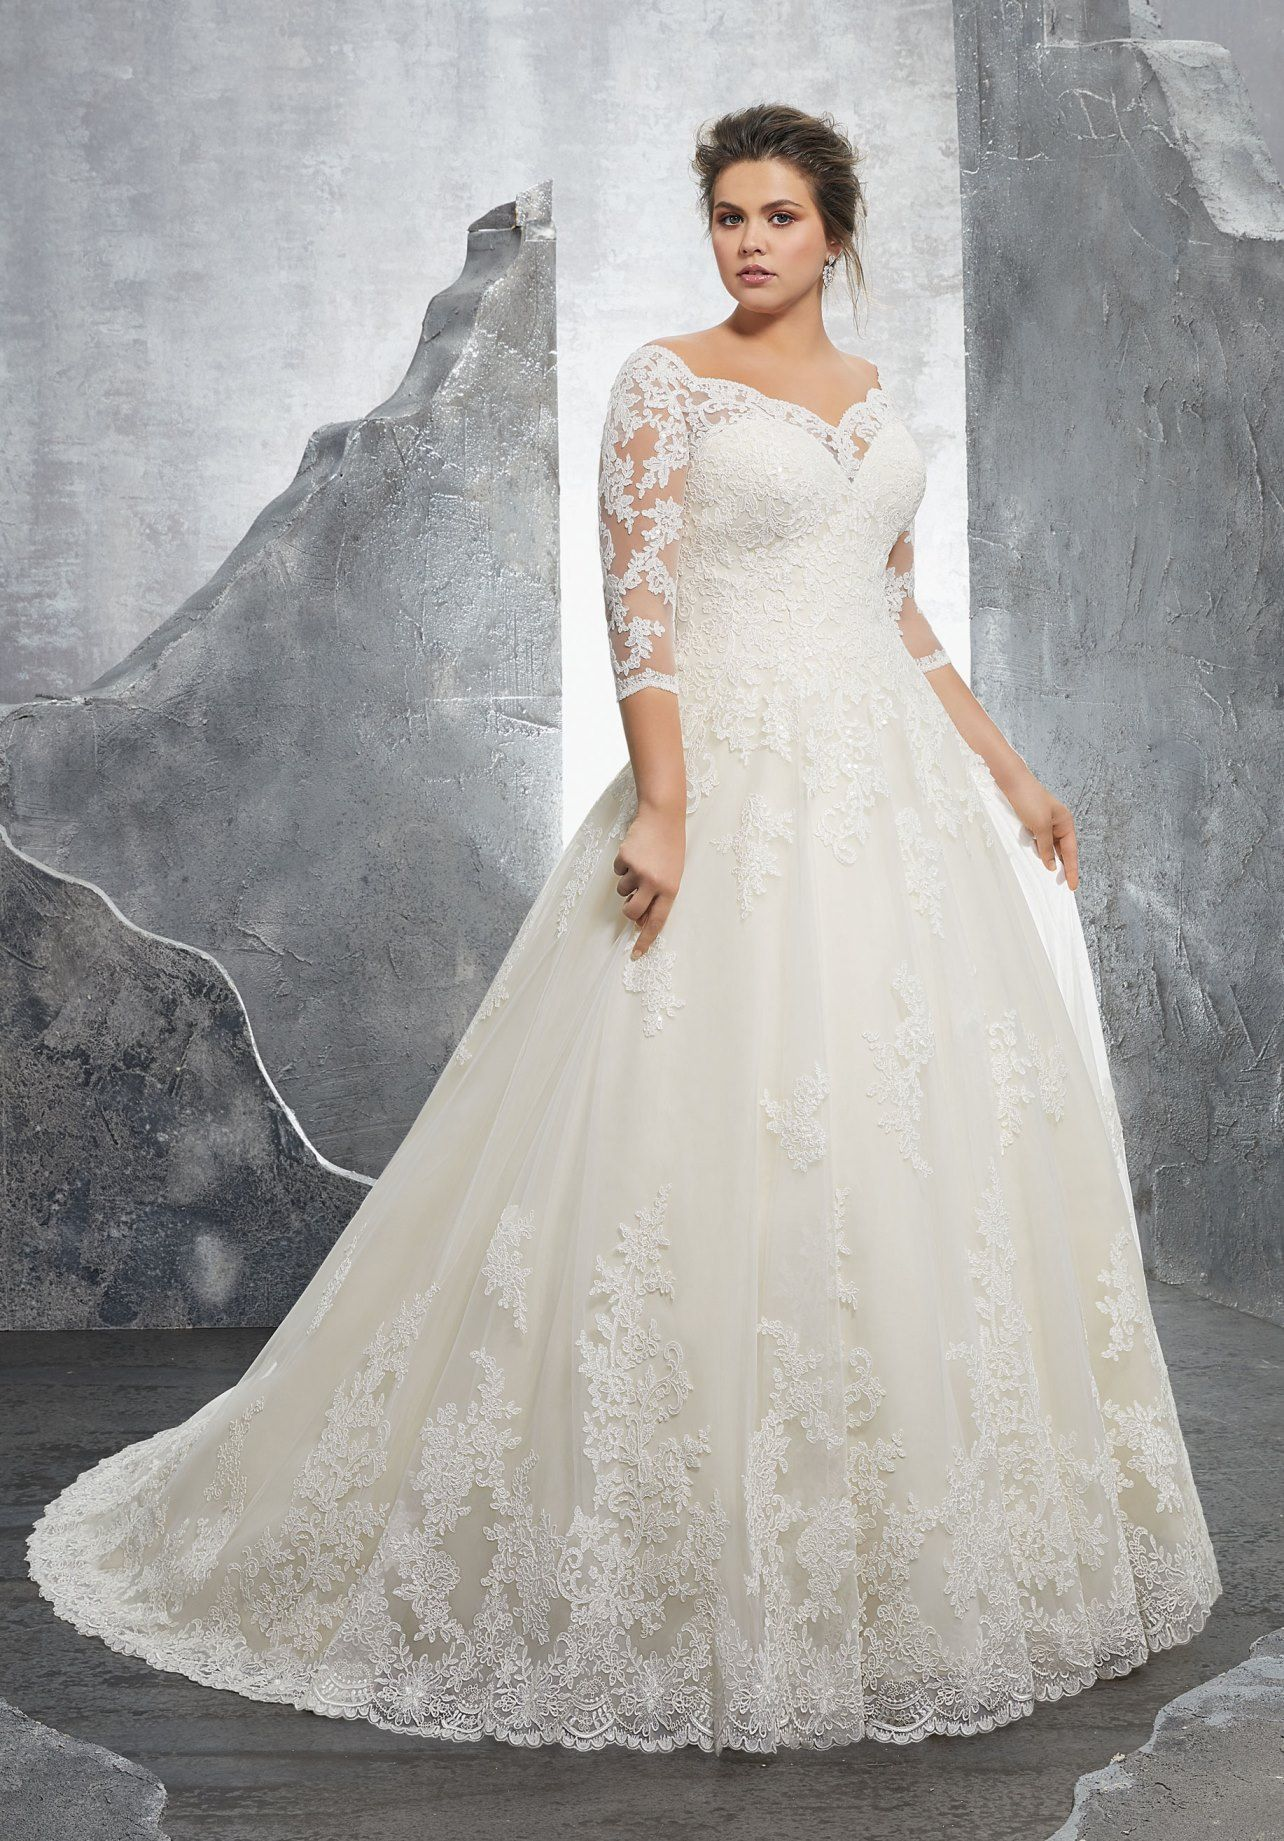 Dress Mori Lee Julietta Spring 2018 Collection 3235 Kosette Plussize Brid Plus Size Wedding Dresses With Sleeves Plus Wedding Dresses Ball Gowns Wedding